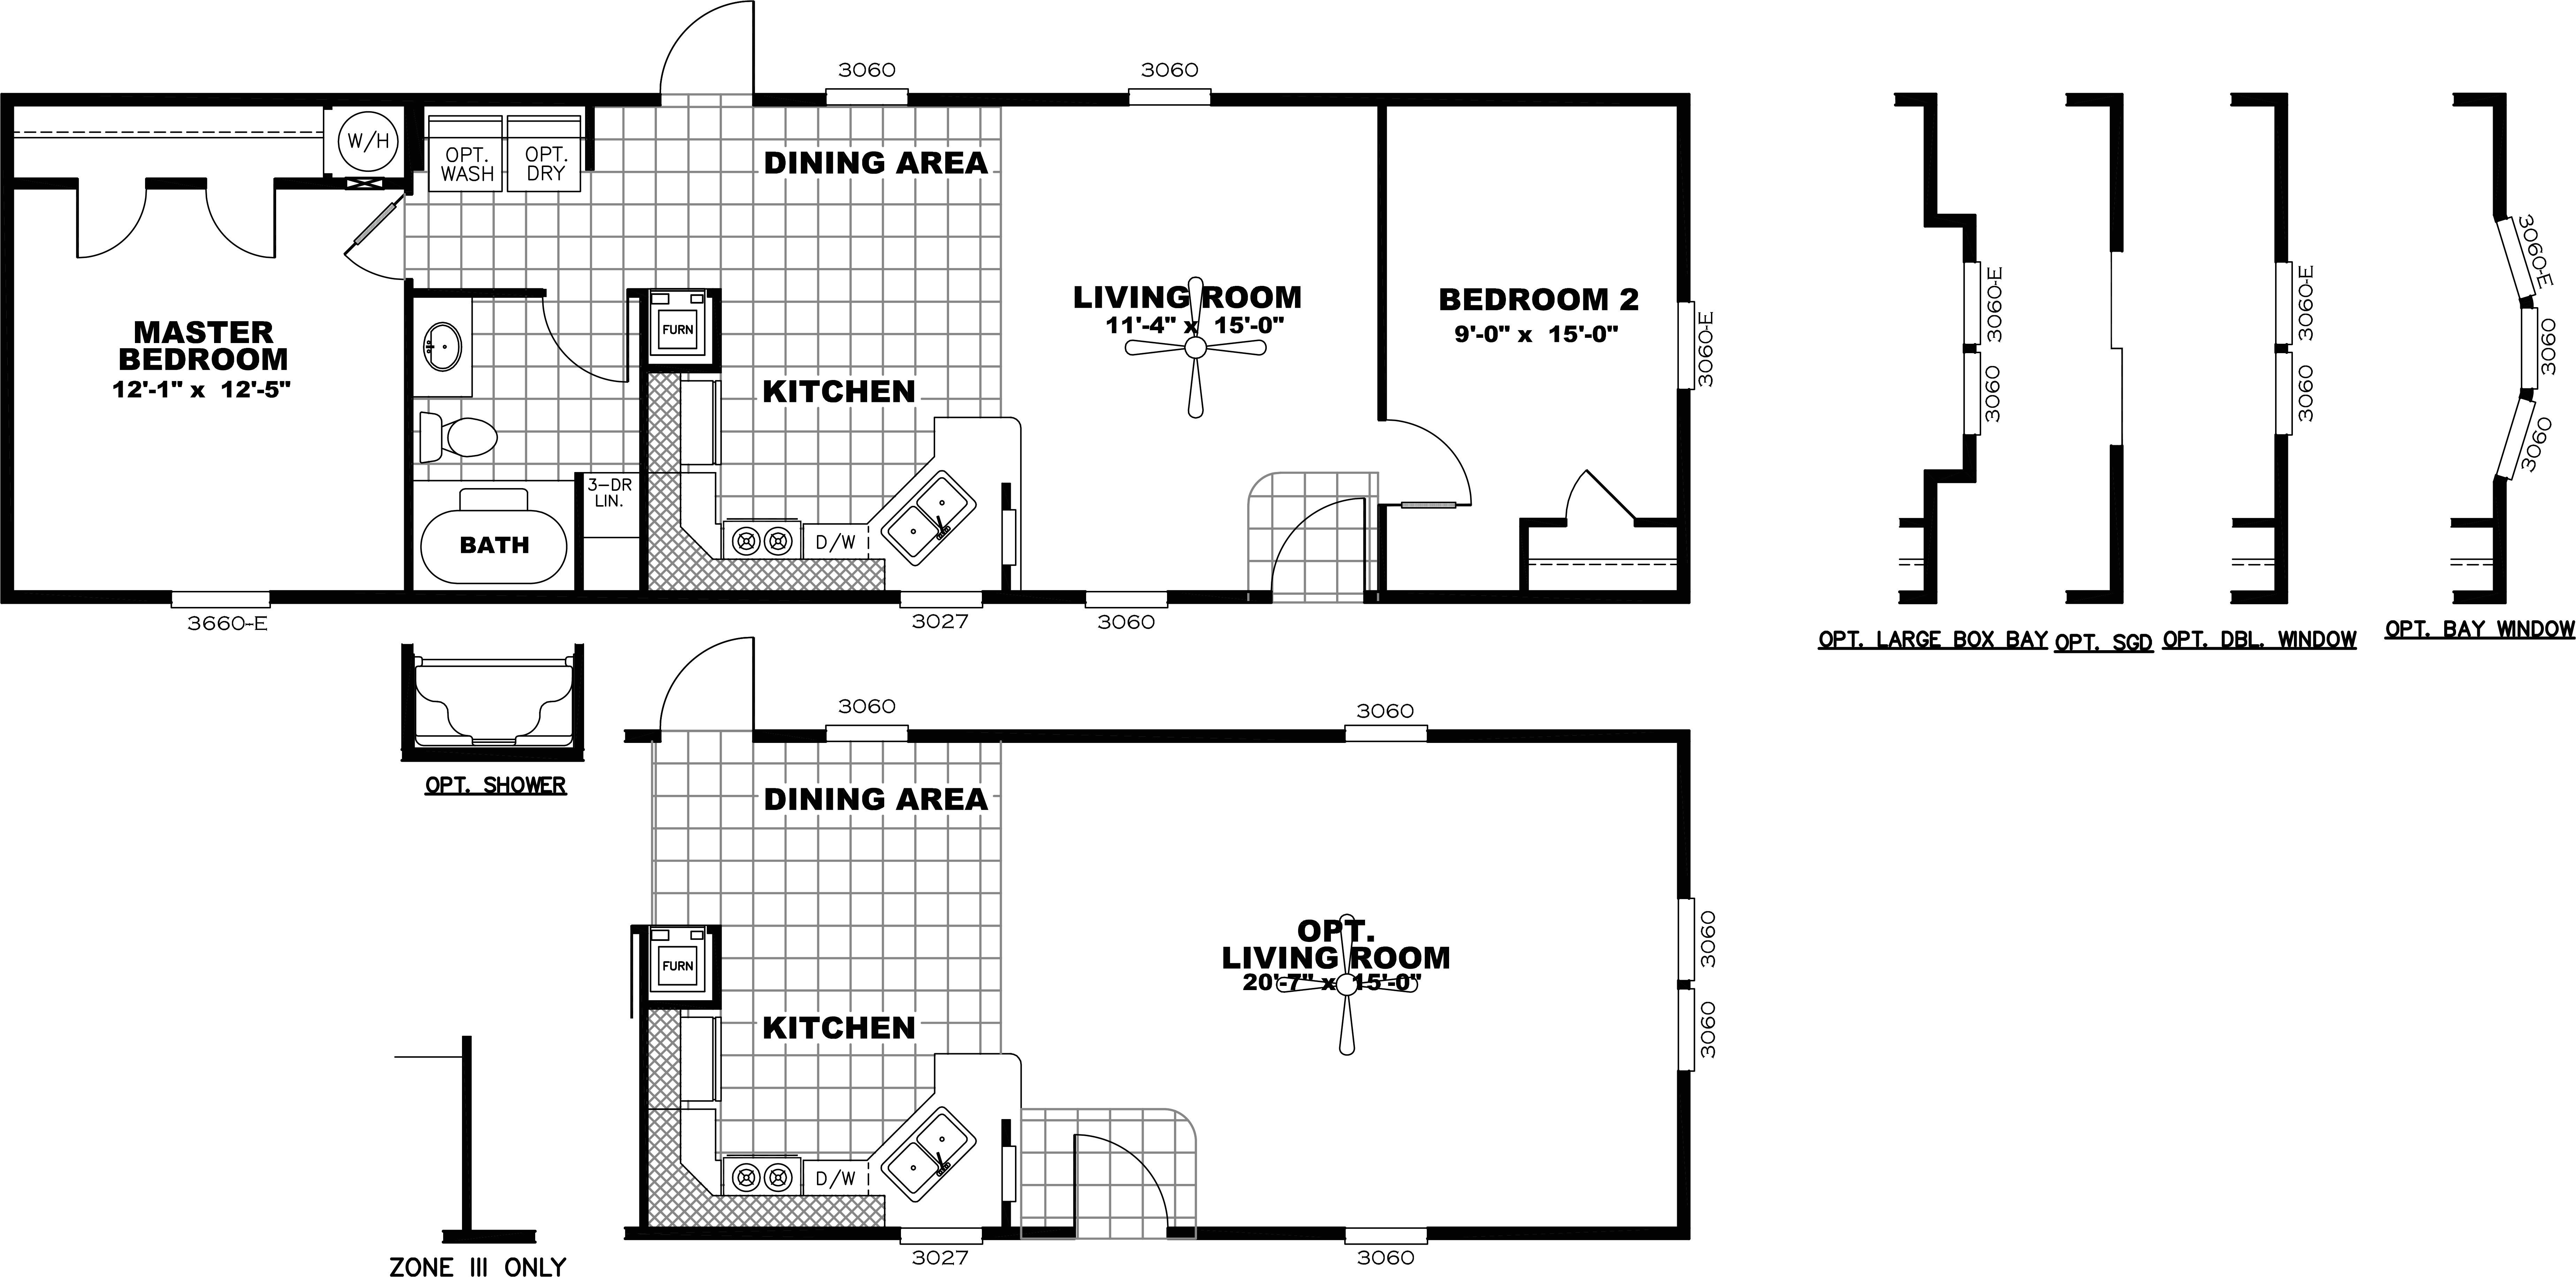 fleetwood mobile homes floor plans